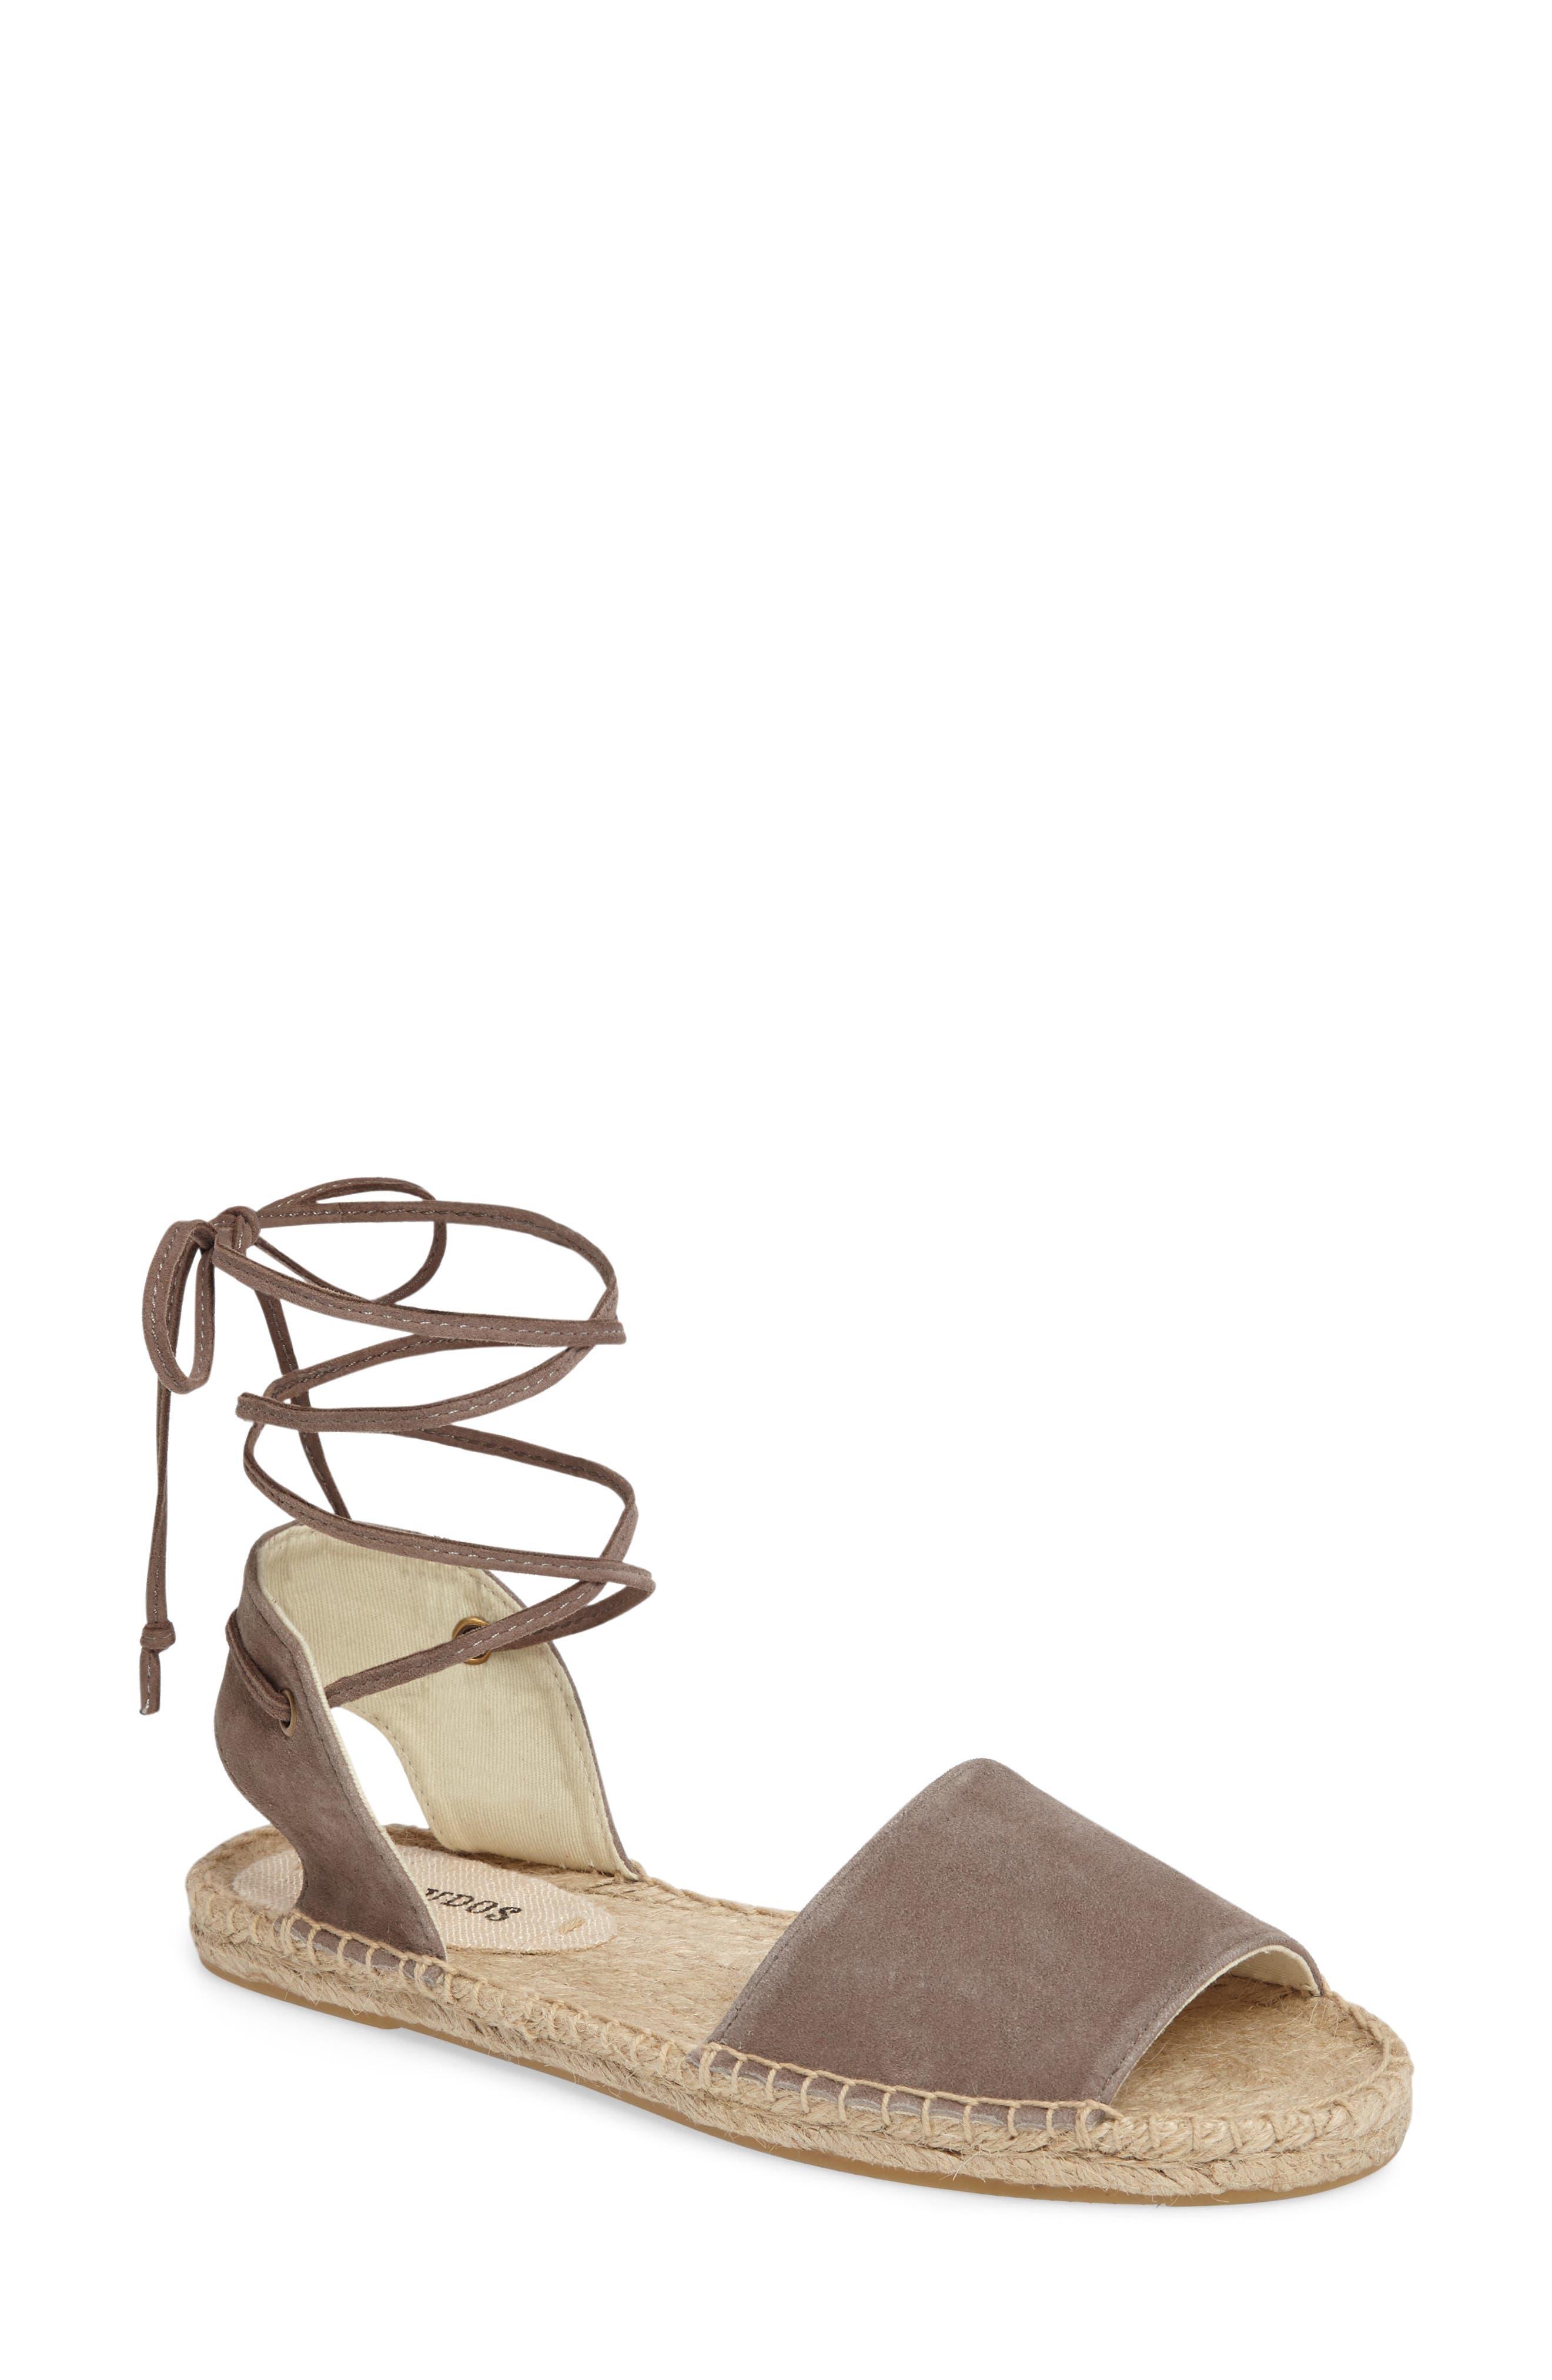 Main Image - Soludos Lace-Up Sandal (Women)